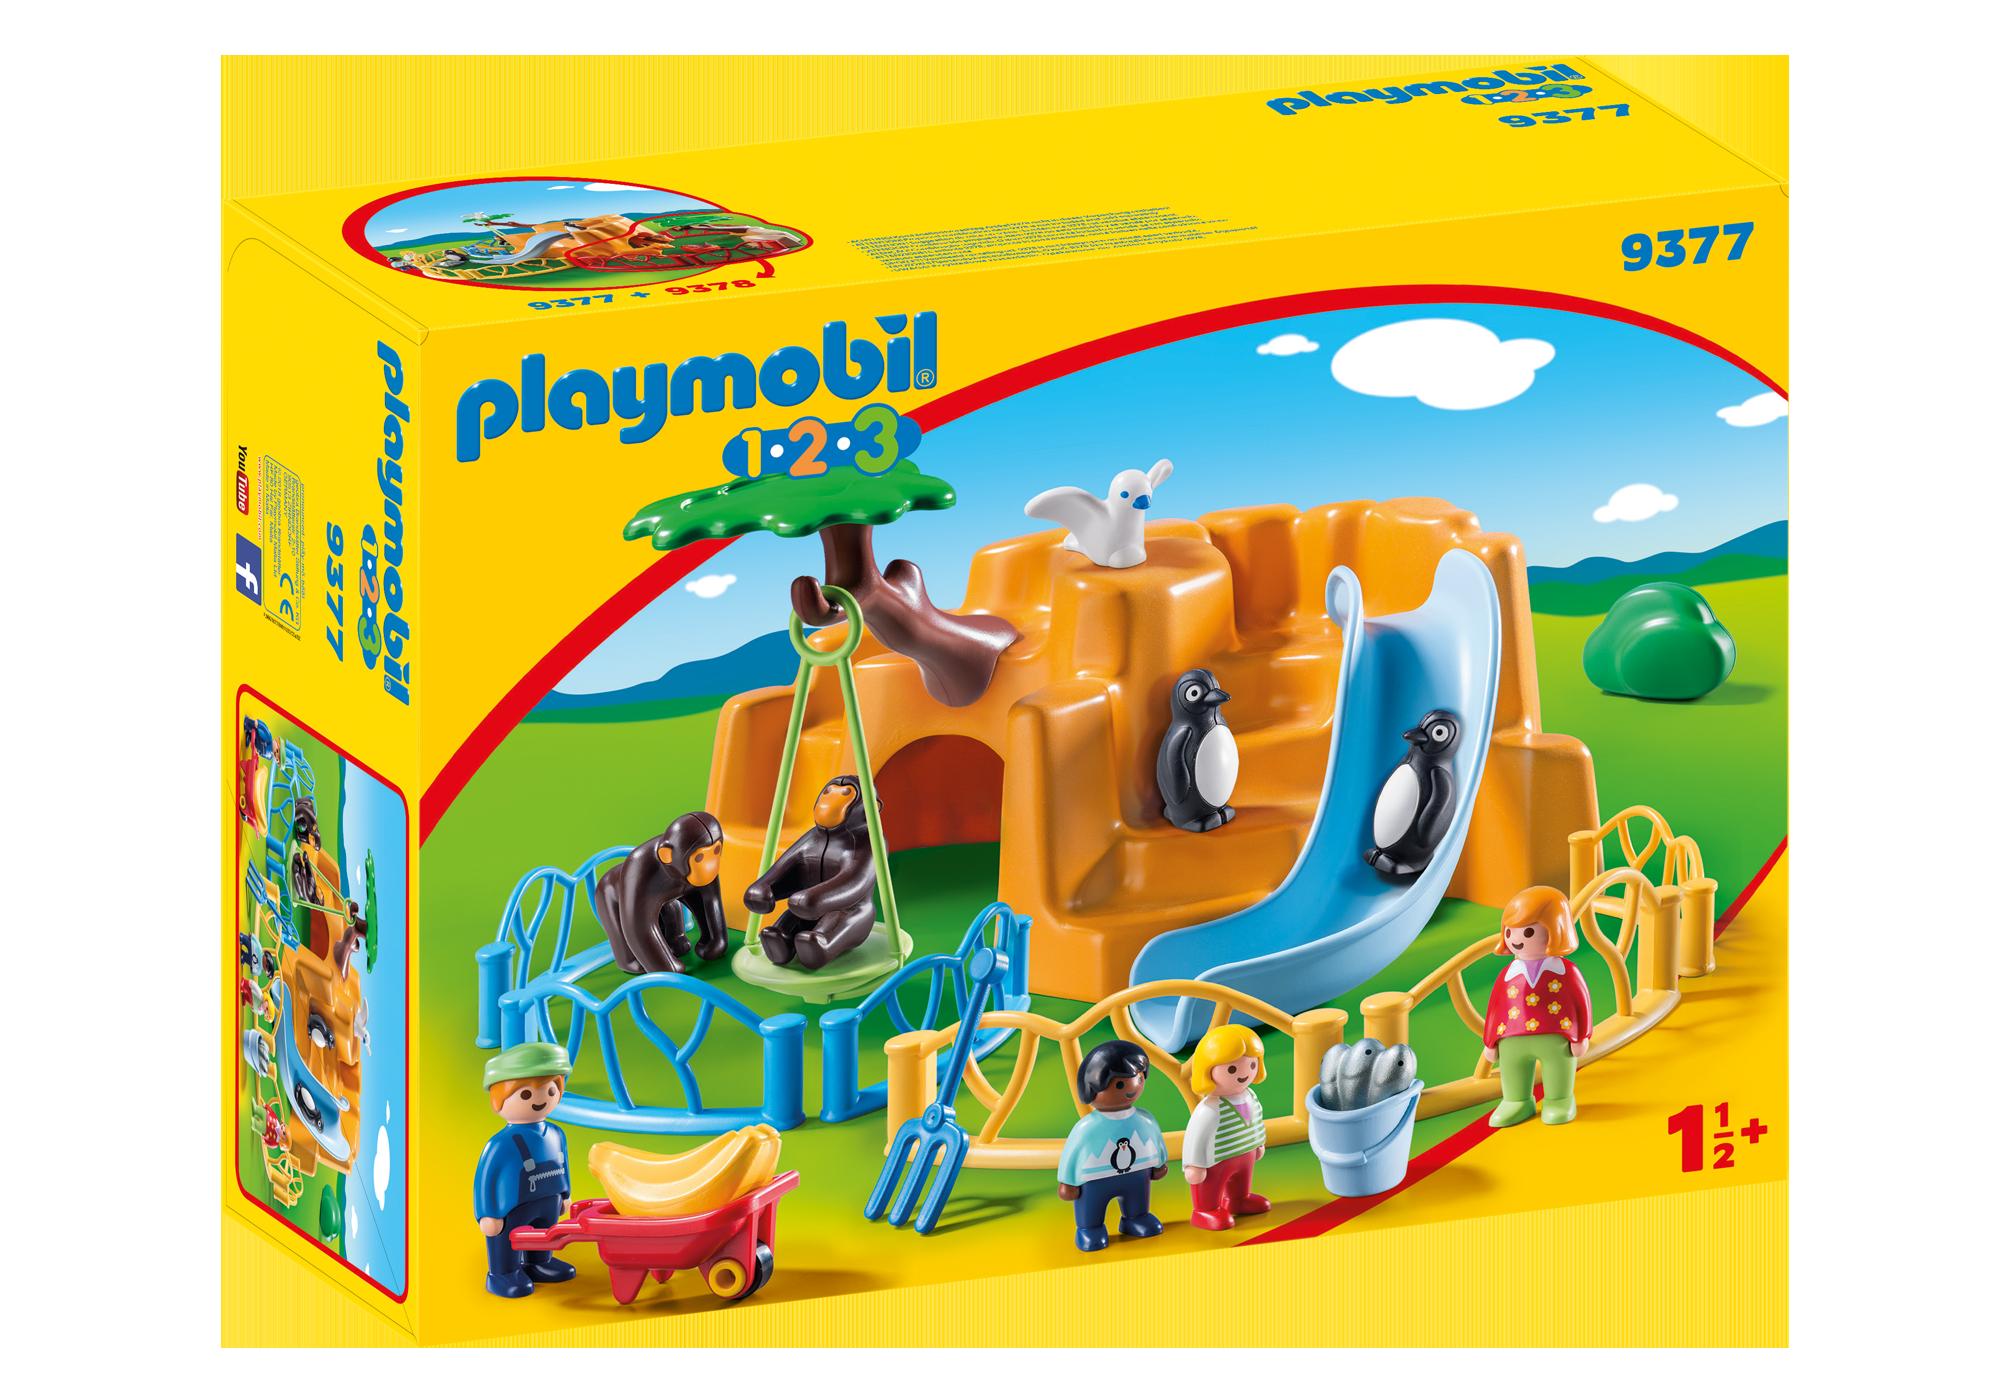 http://media.playmobil.com/i/playmobil/9377_product_box_front/Zoo